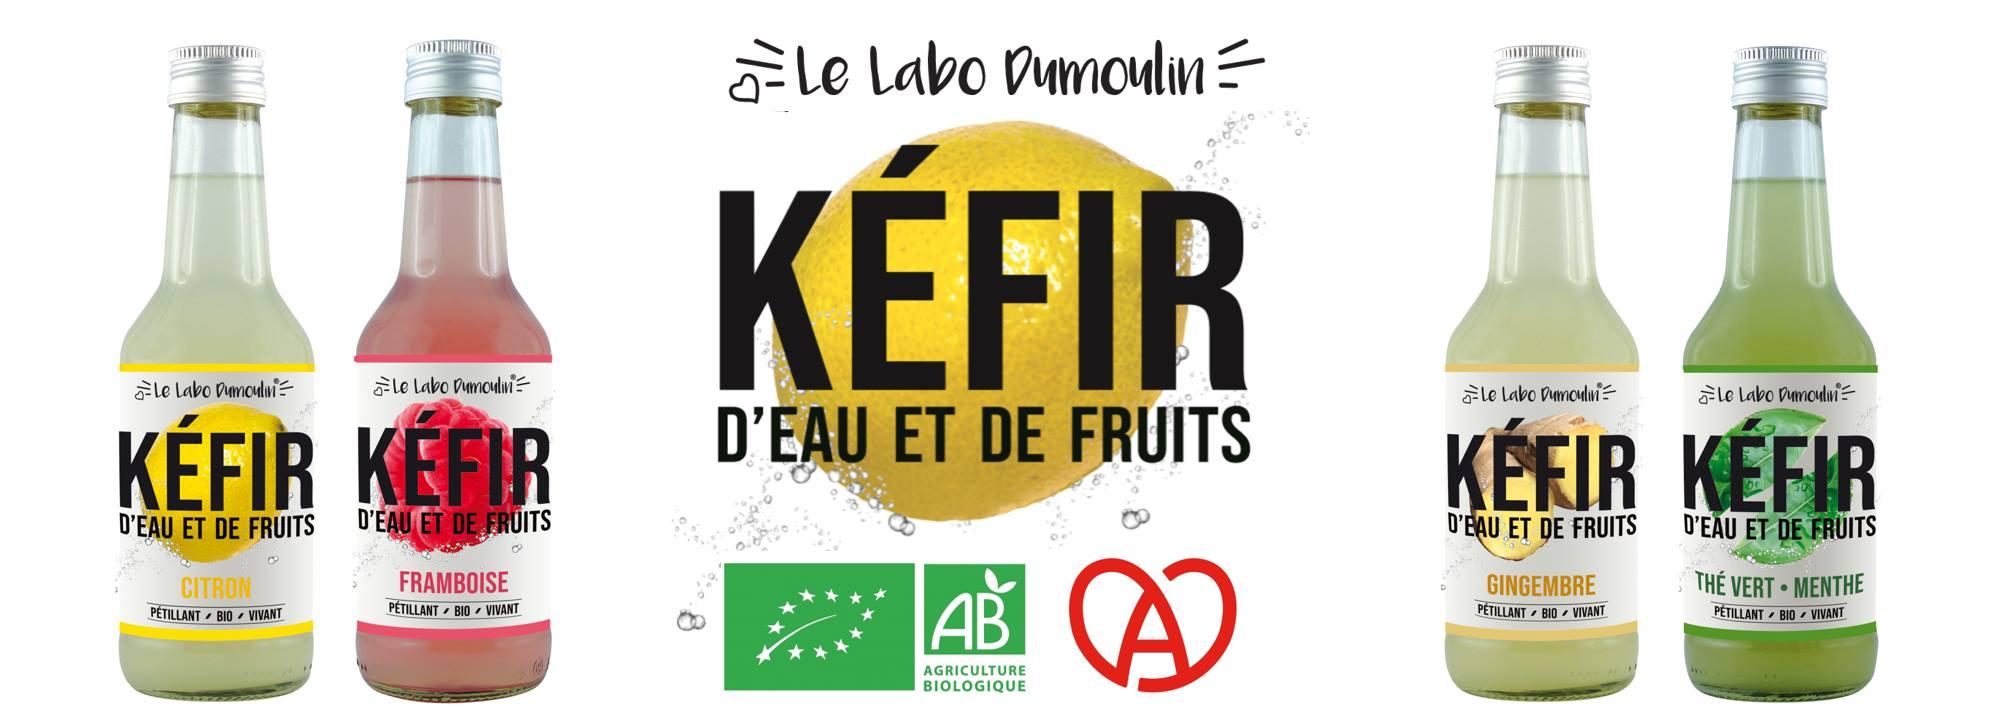 81678257 1320927678110048 1283480006370000896 o - Le Labo Dumoulin, le véritable kéfir de fruits bio